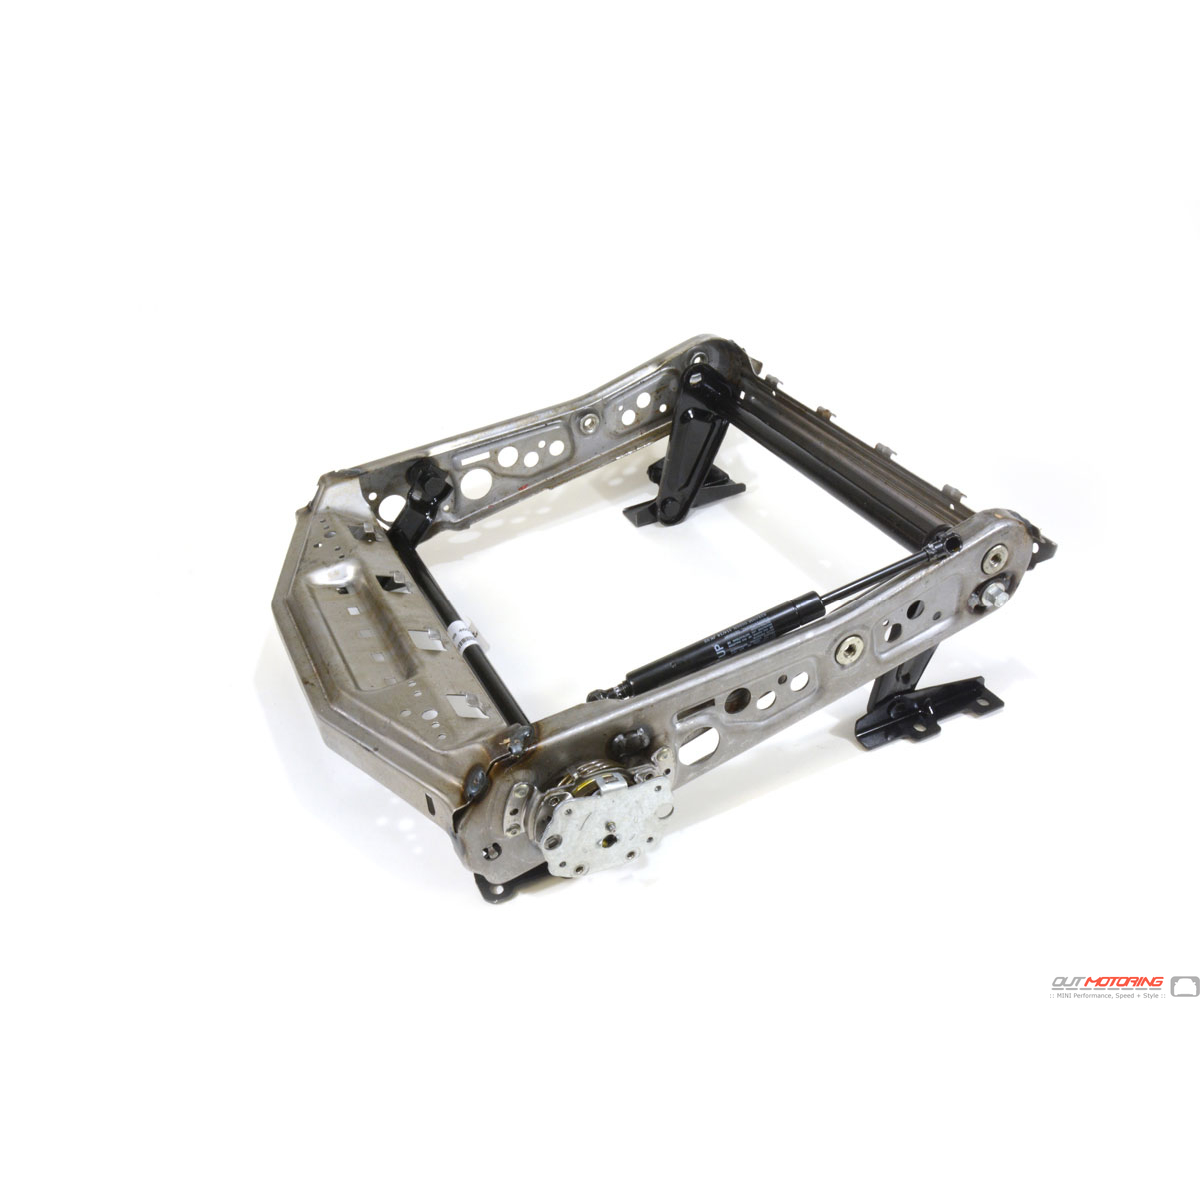 52107138469 52107138470 Mini Cooper R50 R52 R53 Seat Base